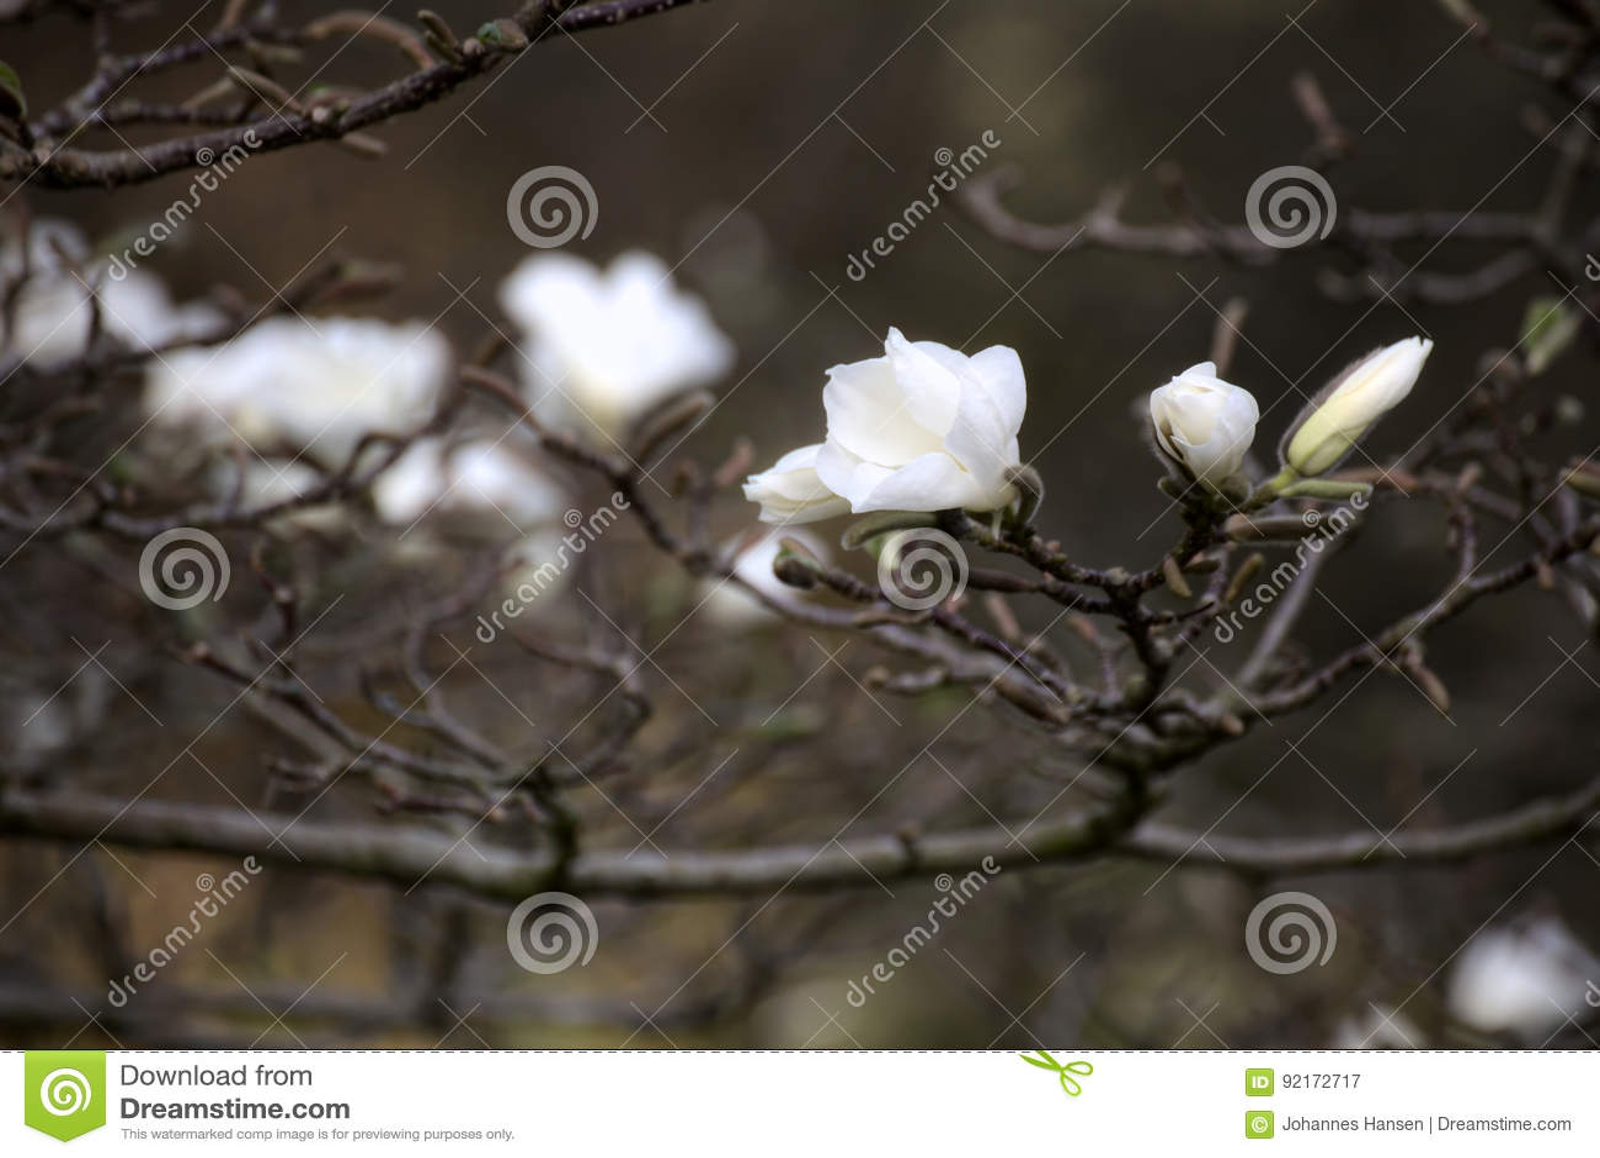 Magnolia kobus, known as mokryeon, with white blossoms